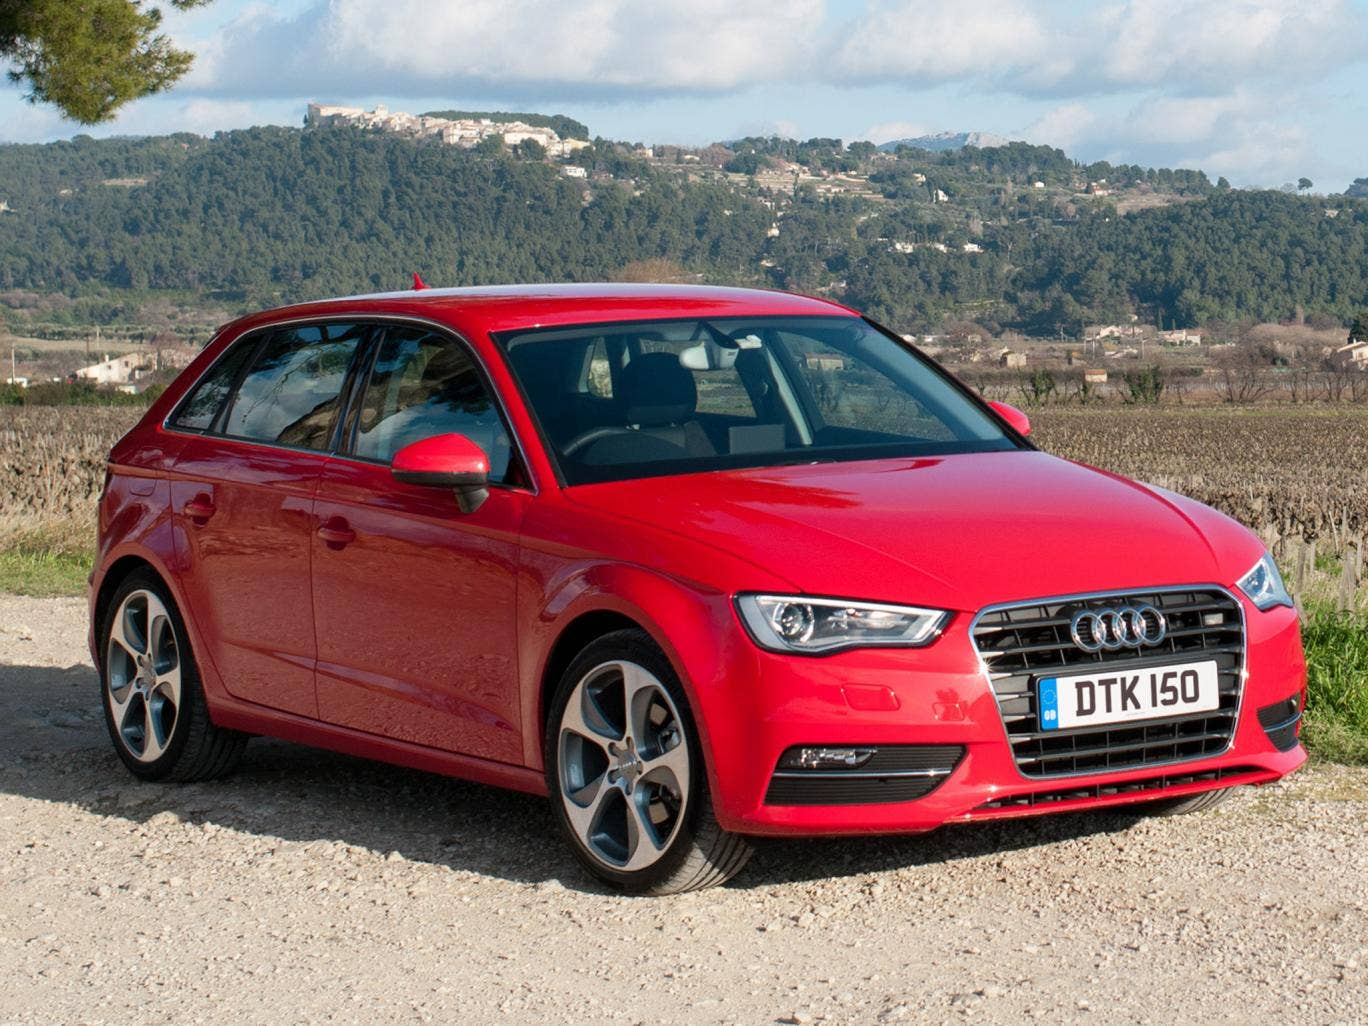 Rapid motorway cruiser: the new Audi A3 Sportback